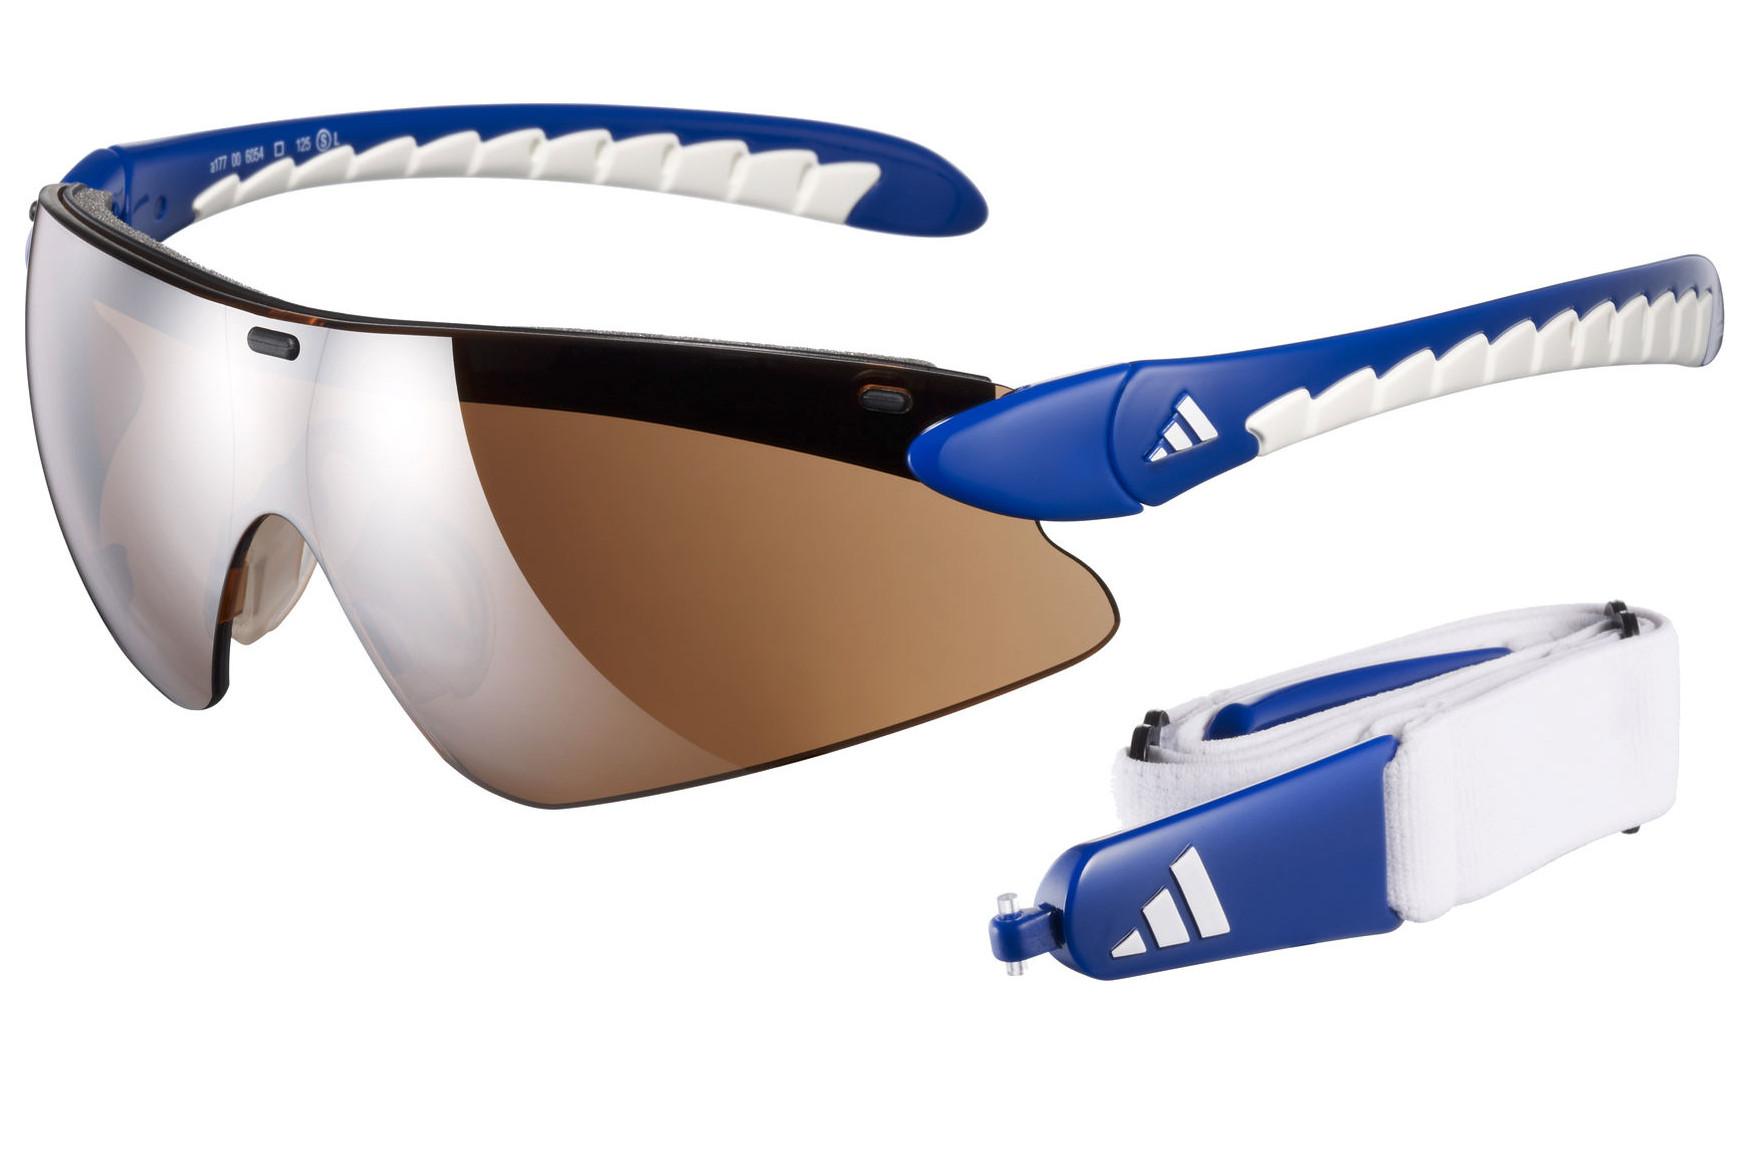 adidas-supernova-pro-blue-white-2013.jpg